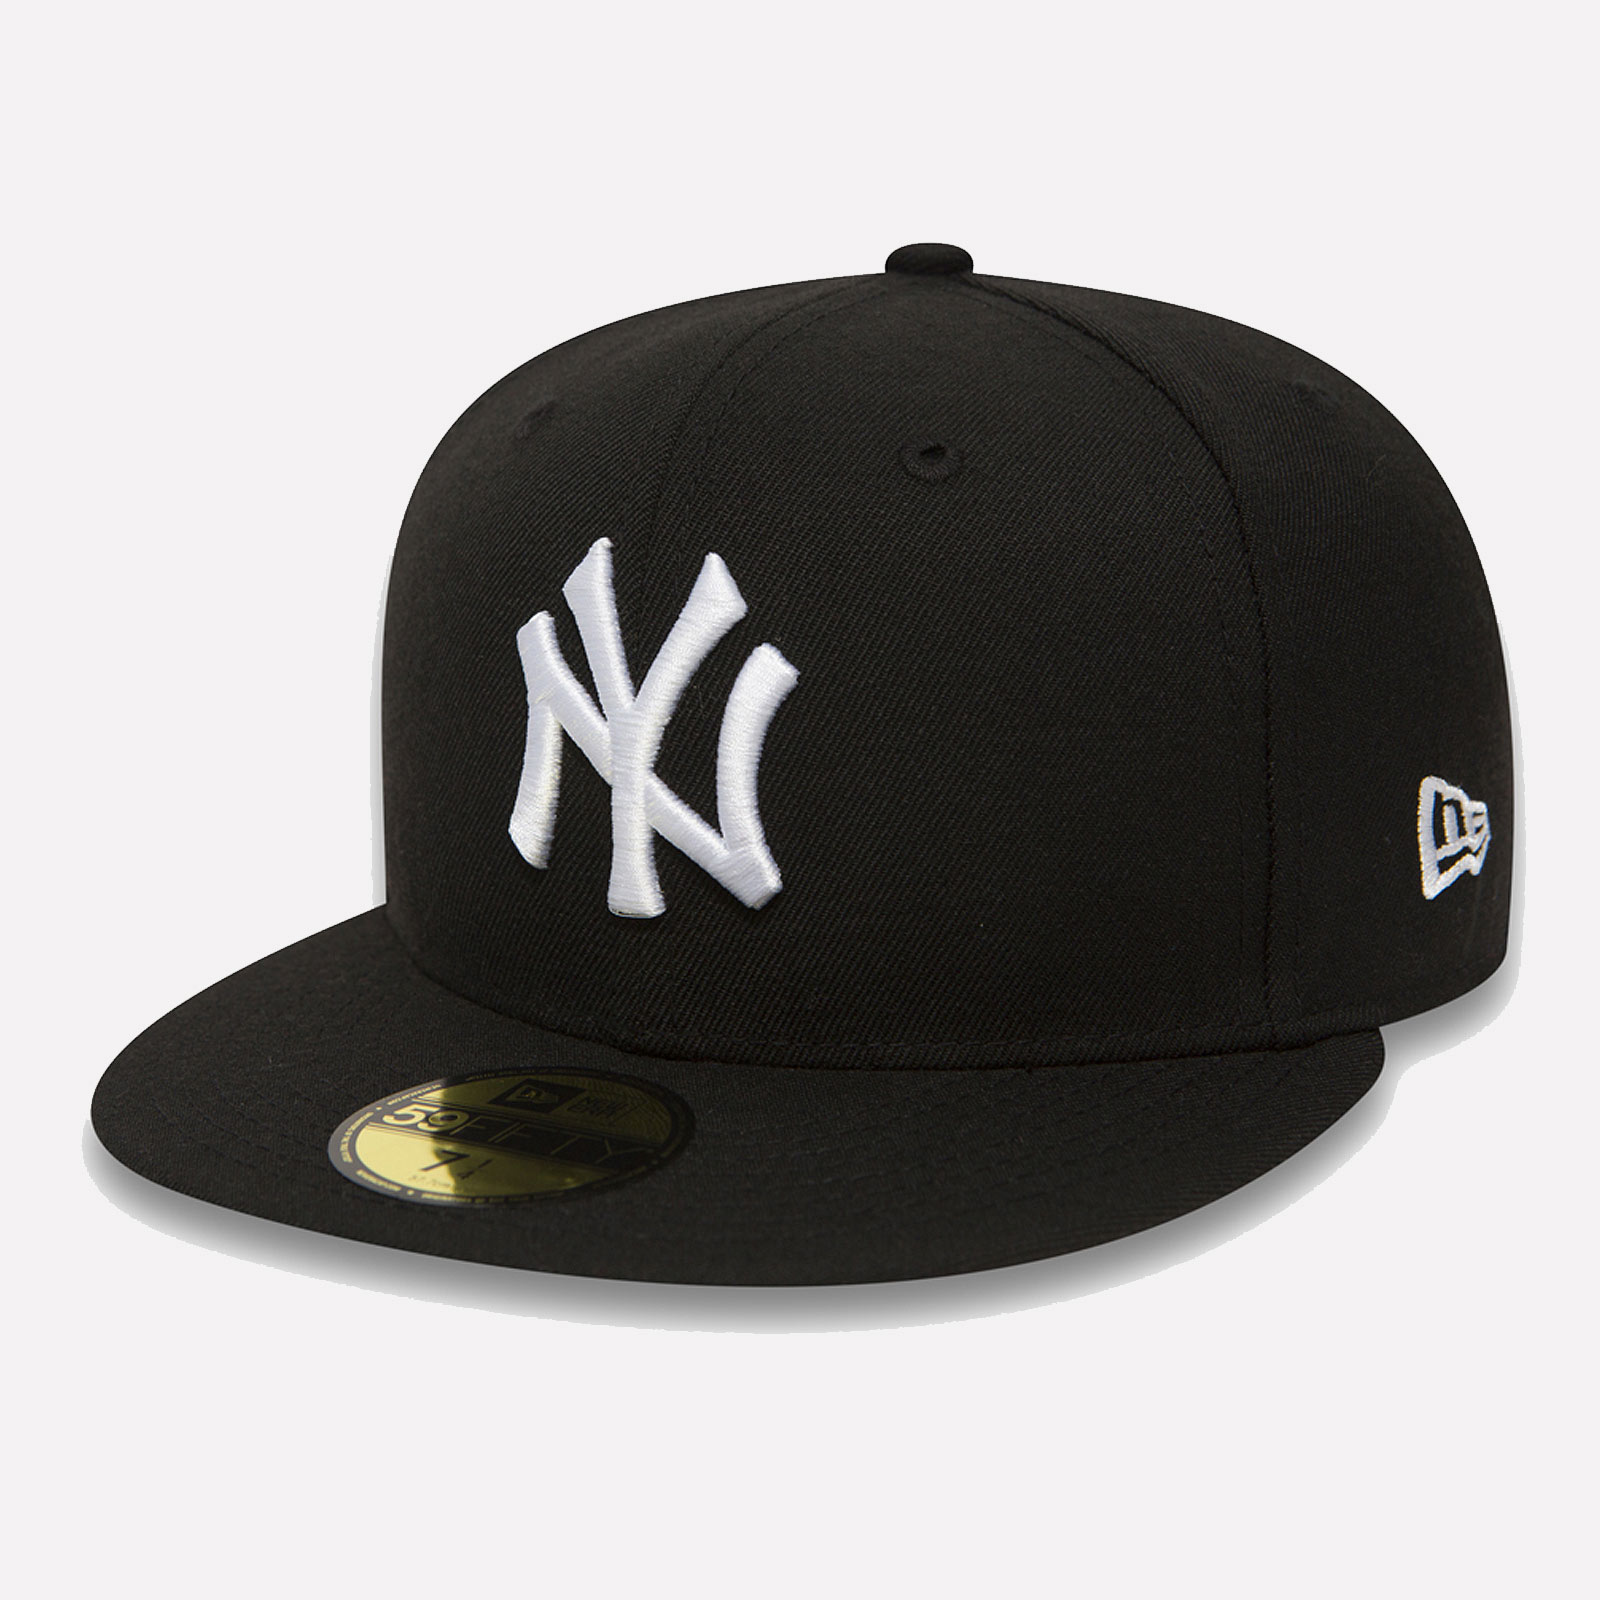 972fc7fb3c360 New Era Cap 59fifty Ajustado York Yankees Béisbol MLB Gorra ...